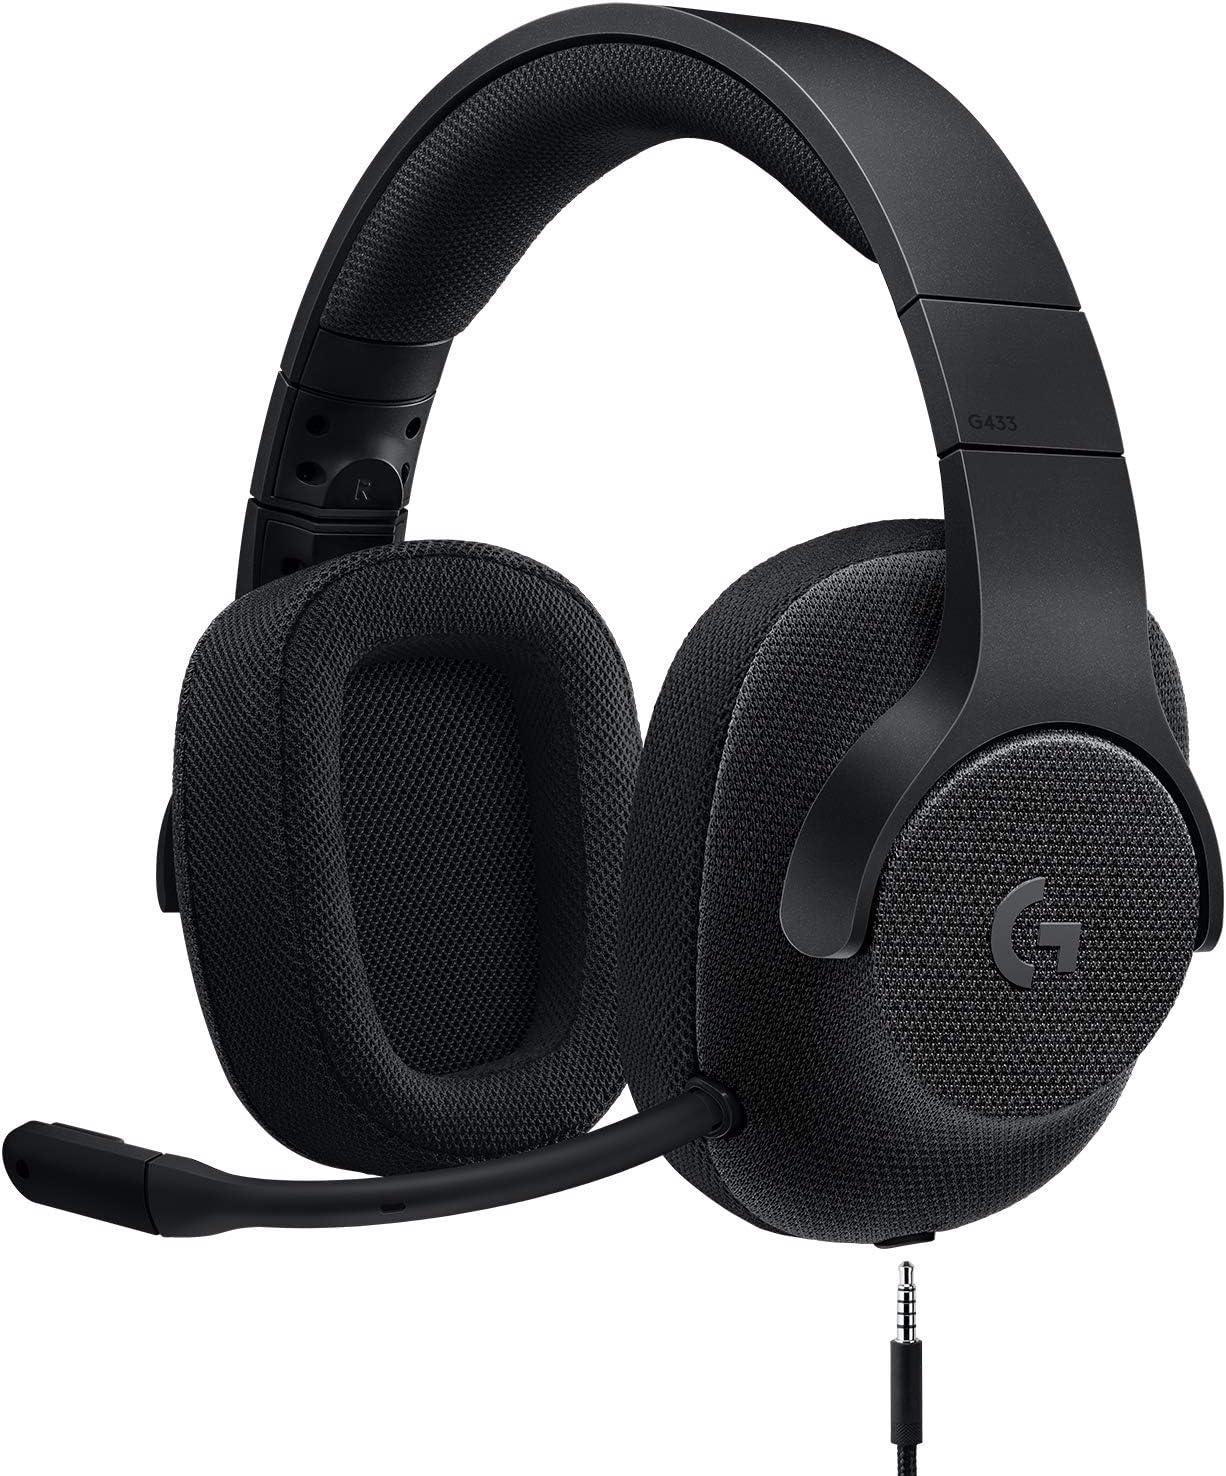 Logitech G433 7.1. - Gaming Headsets